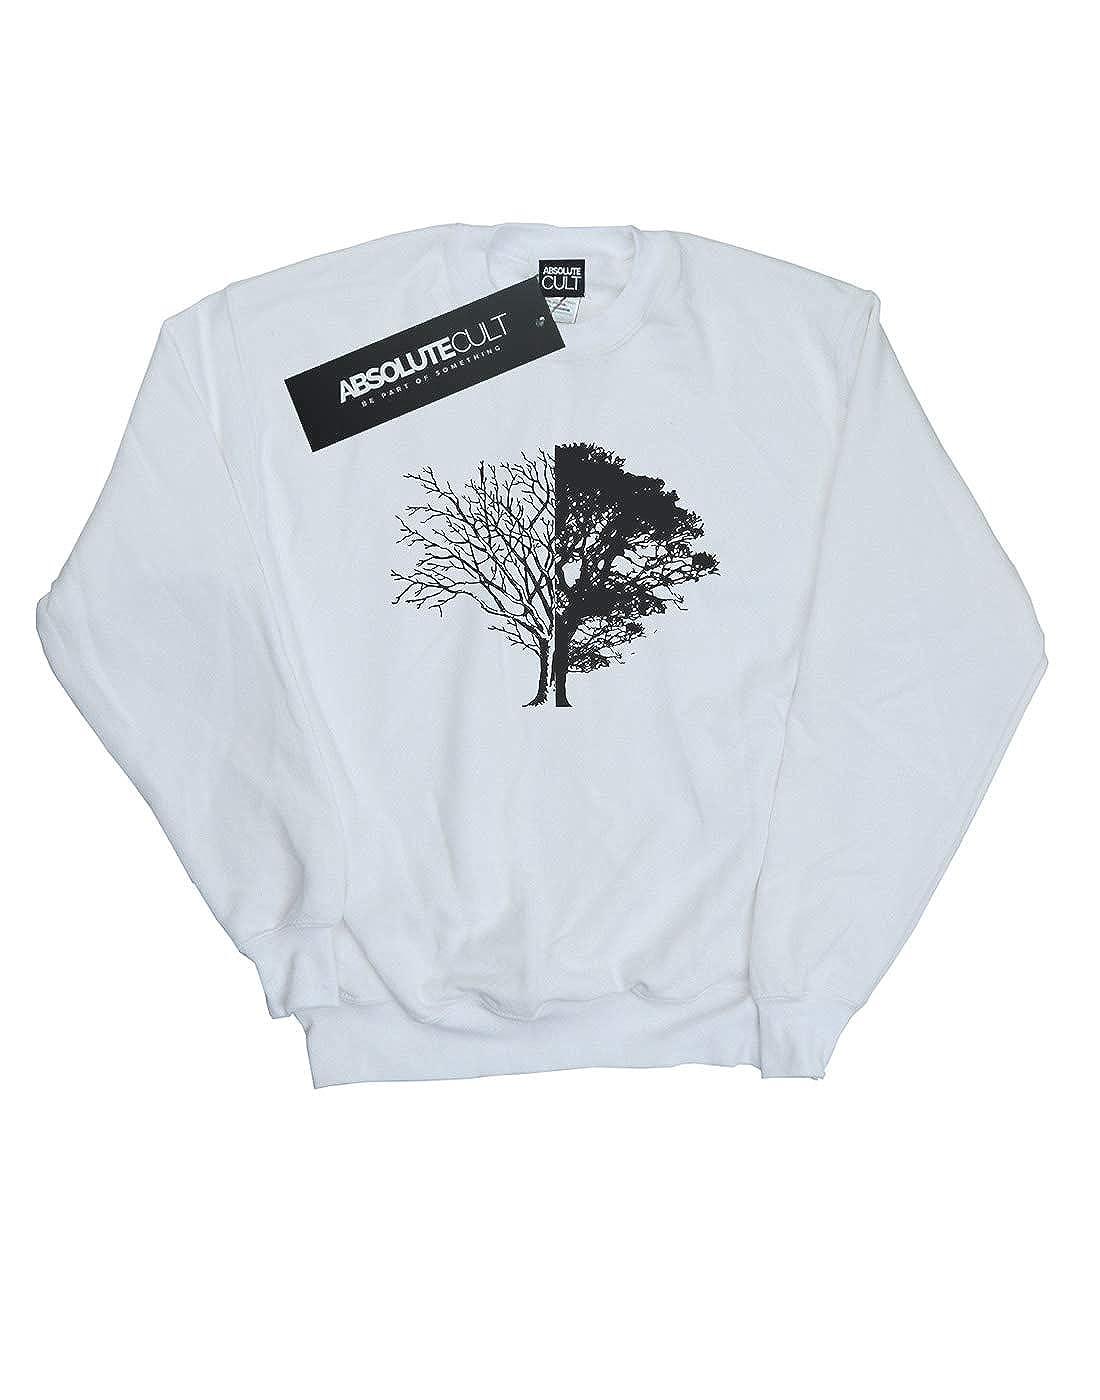 Absolute Cult Drewbacca Girls Life and Death Sweatshirt